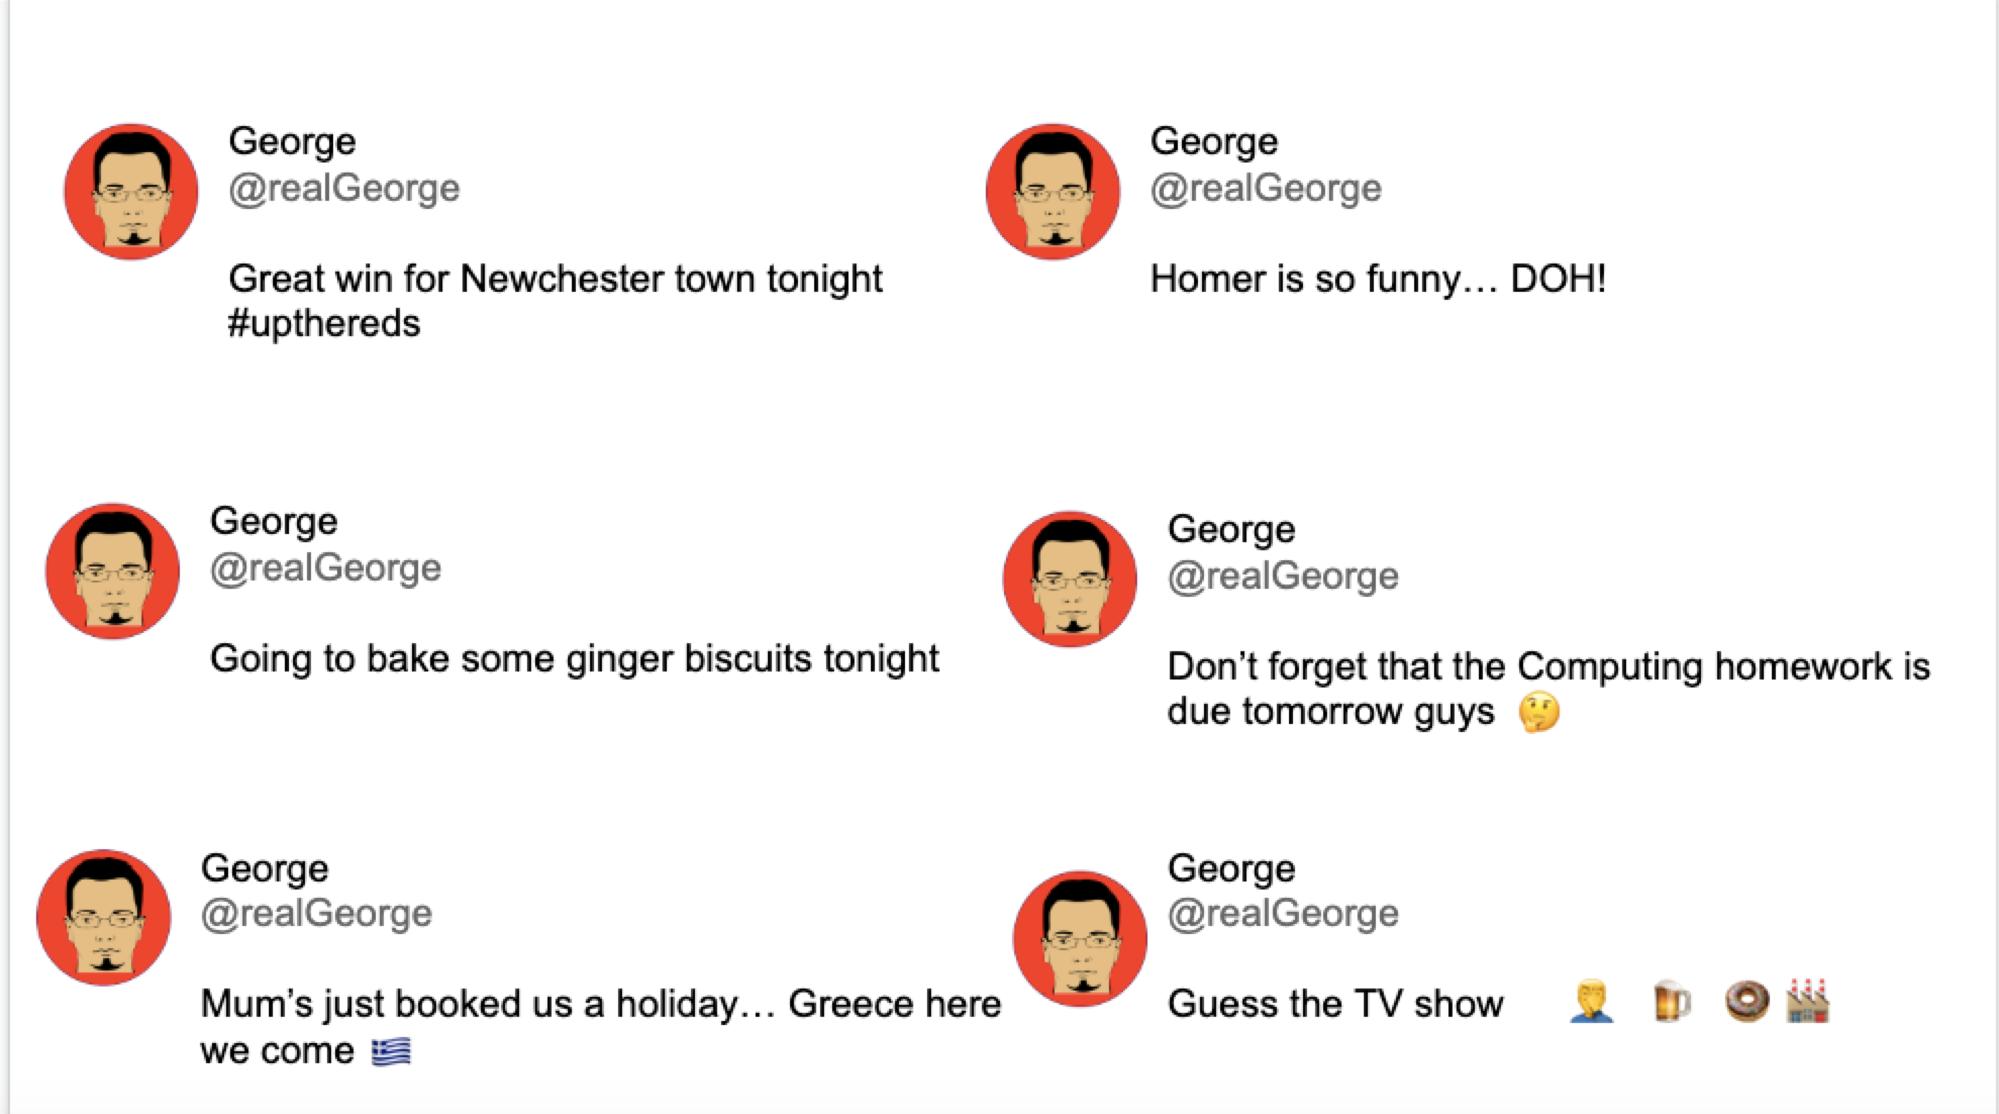 George's social media posts